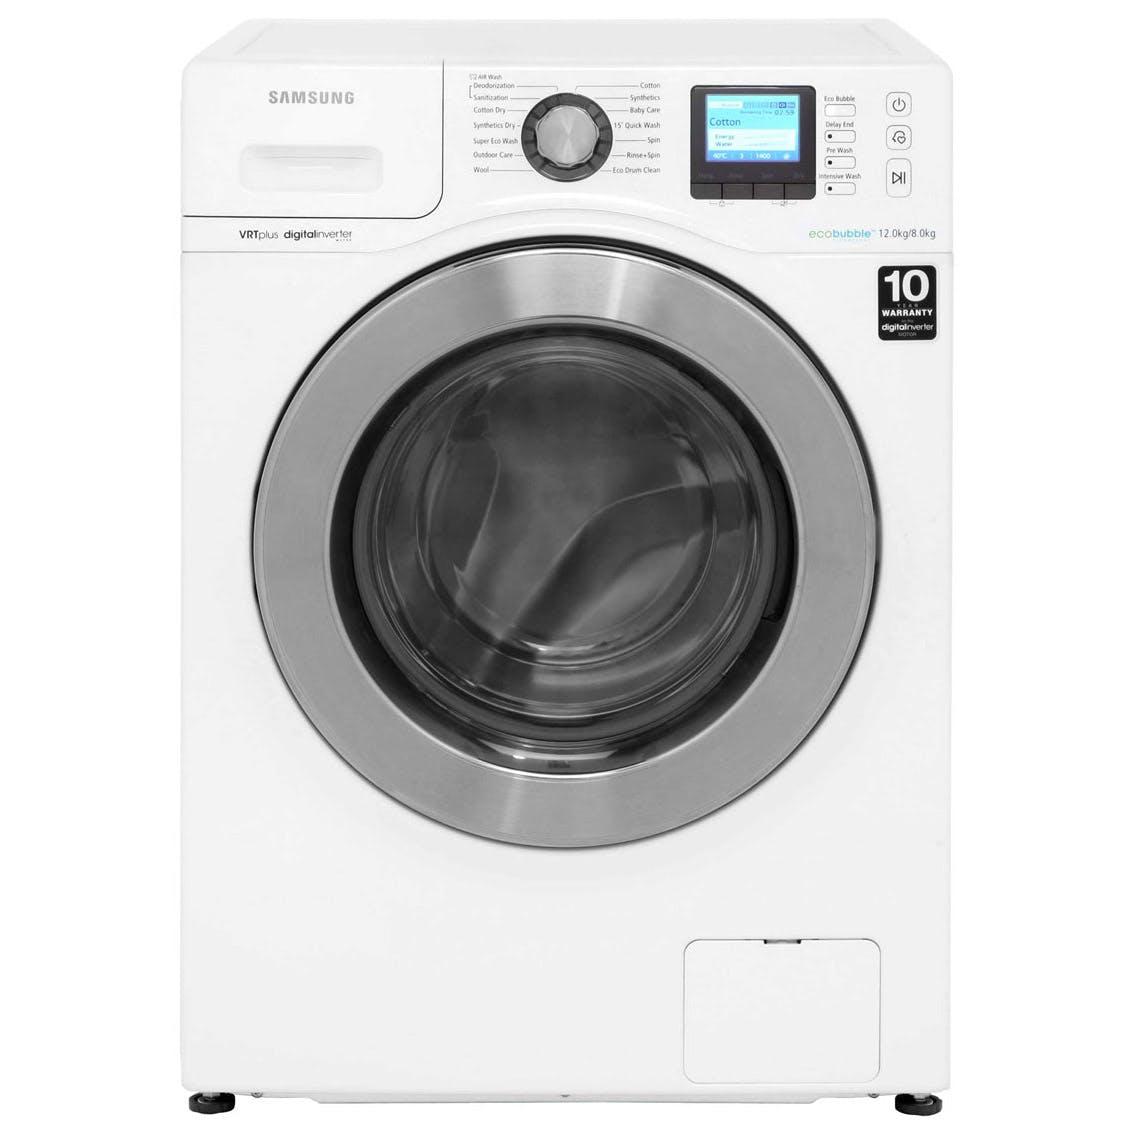 samsung wd12f9c9u4w eco bubble washer dryer in white. Black Bedroom Furniture Sets. Home Design Ideas